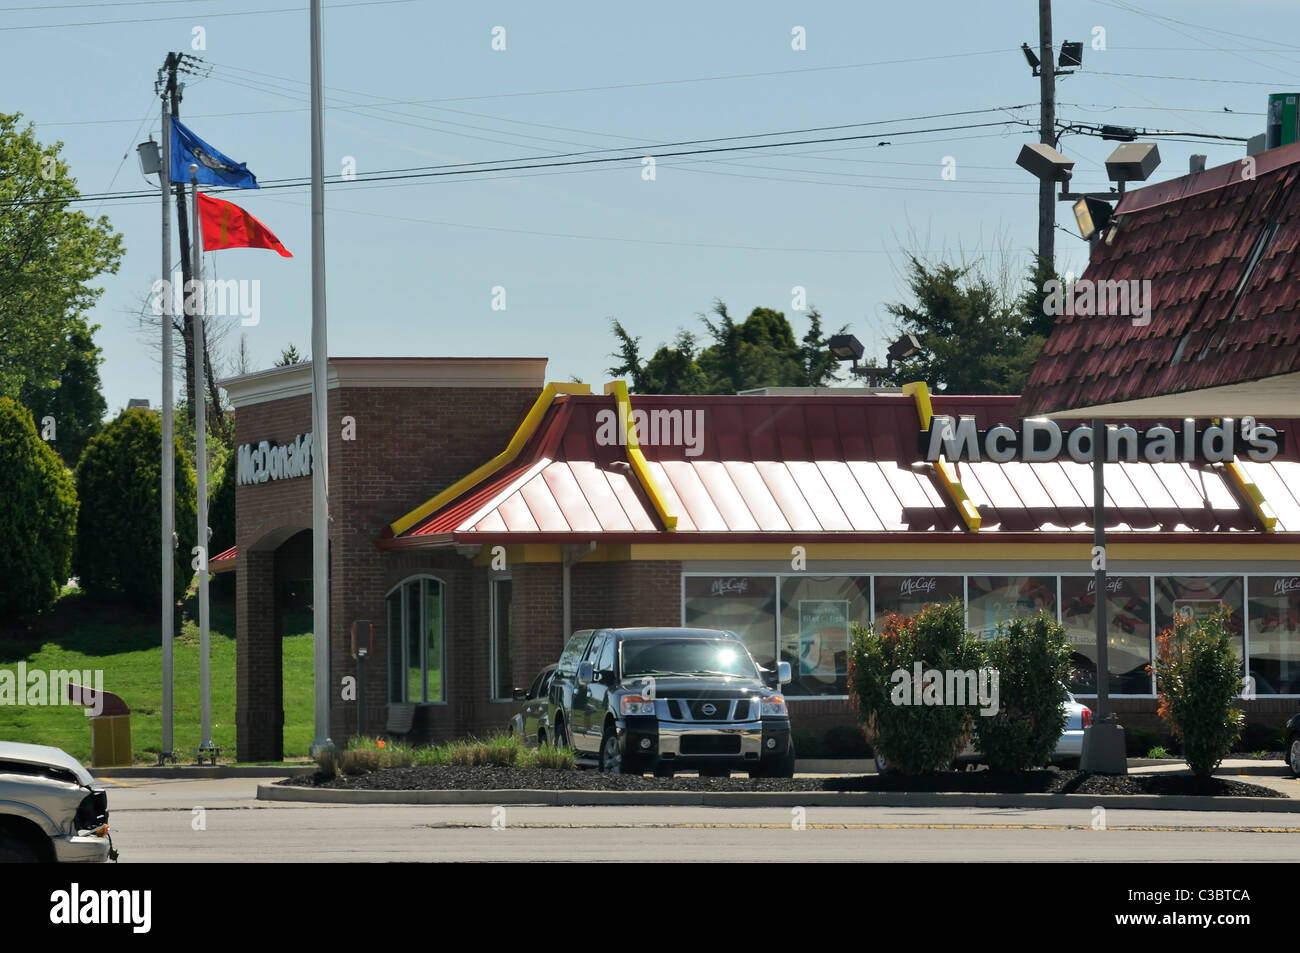 Mcdonalds Fast Food Restaurant In Stock Photos & Mcdonalds Fast Food ...